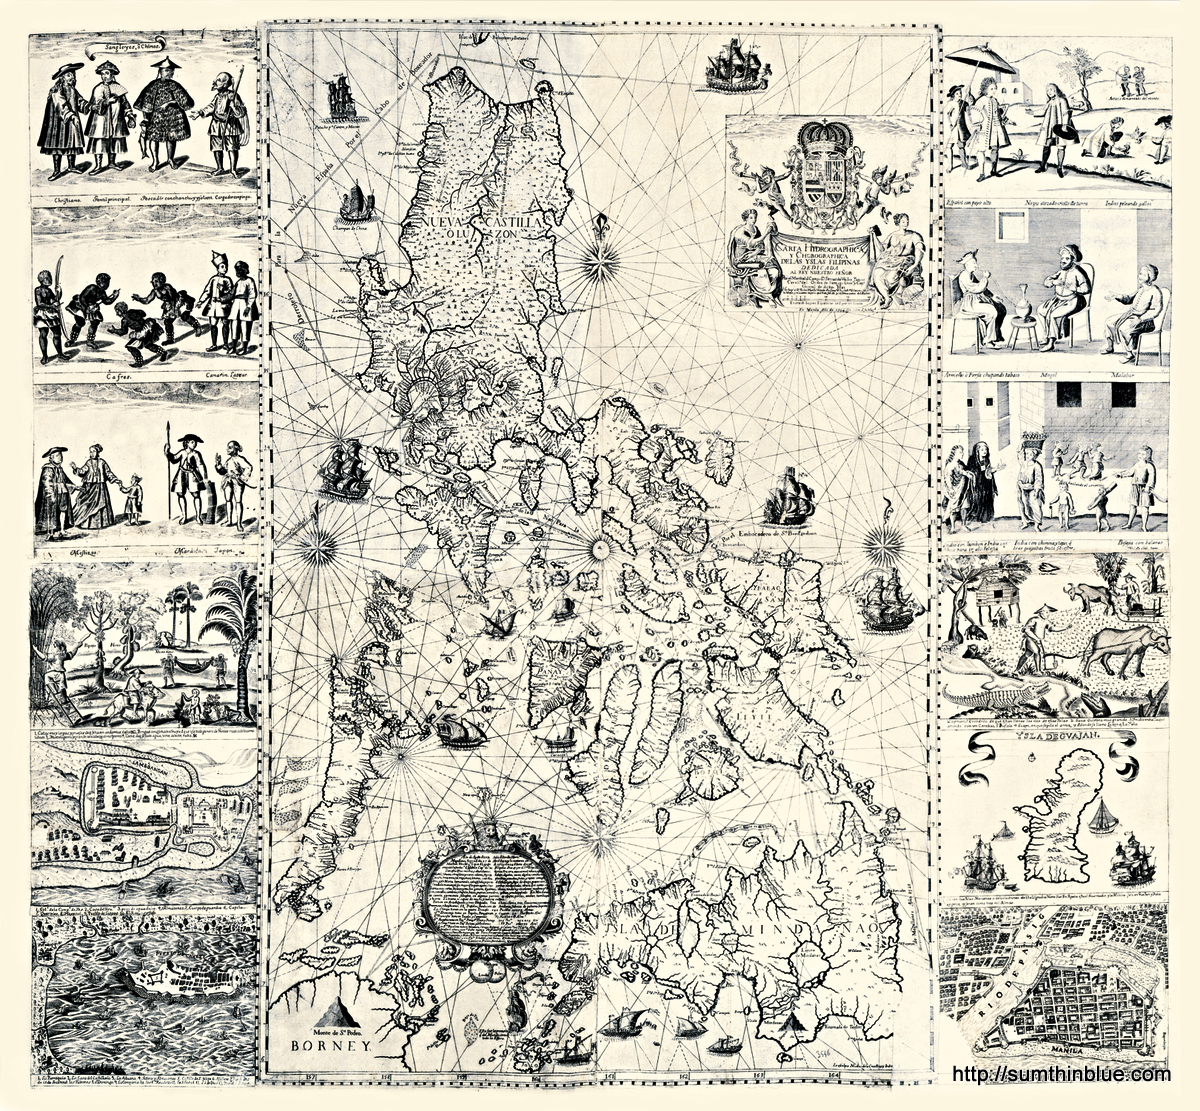 http://sumthinblue.com/wp-content/uploads/2010/03/CHAP9_opener_Filipinasmurillo-velarde.jpg